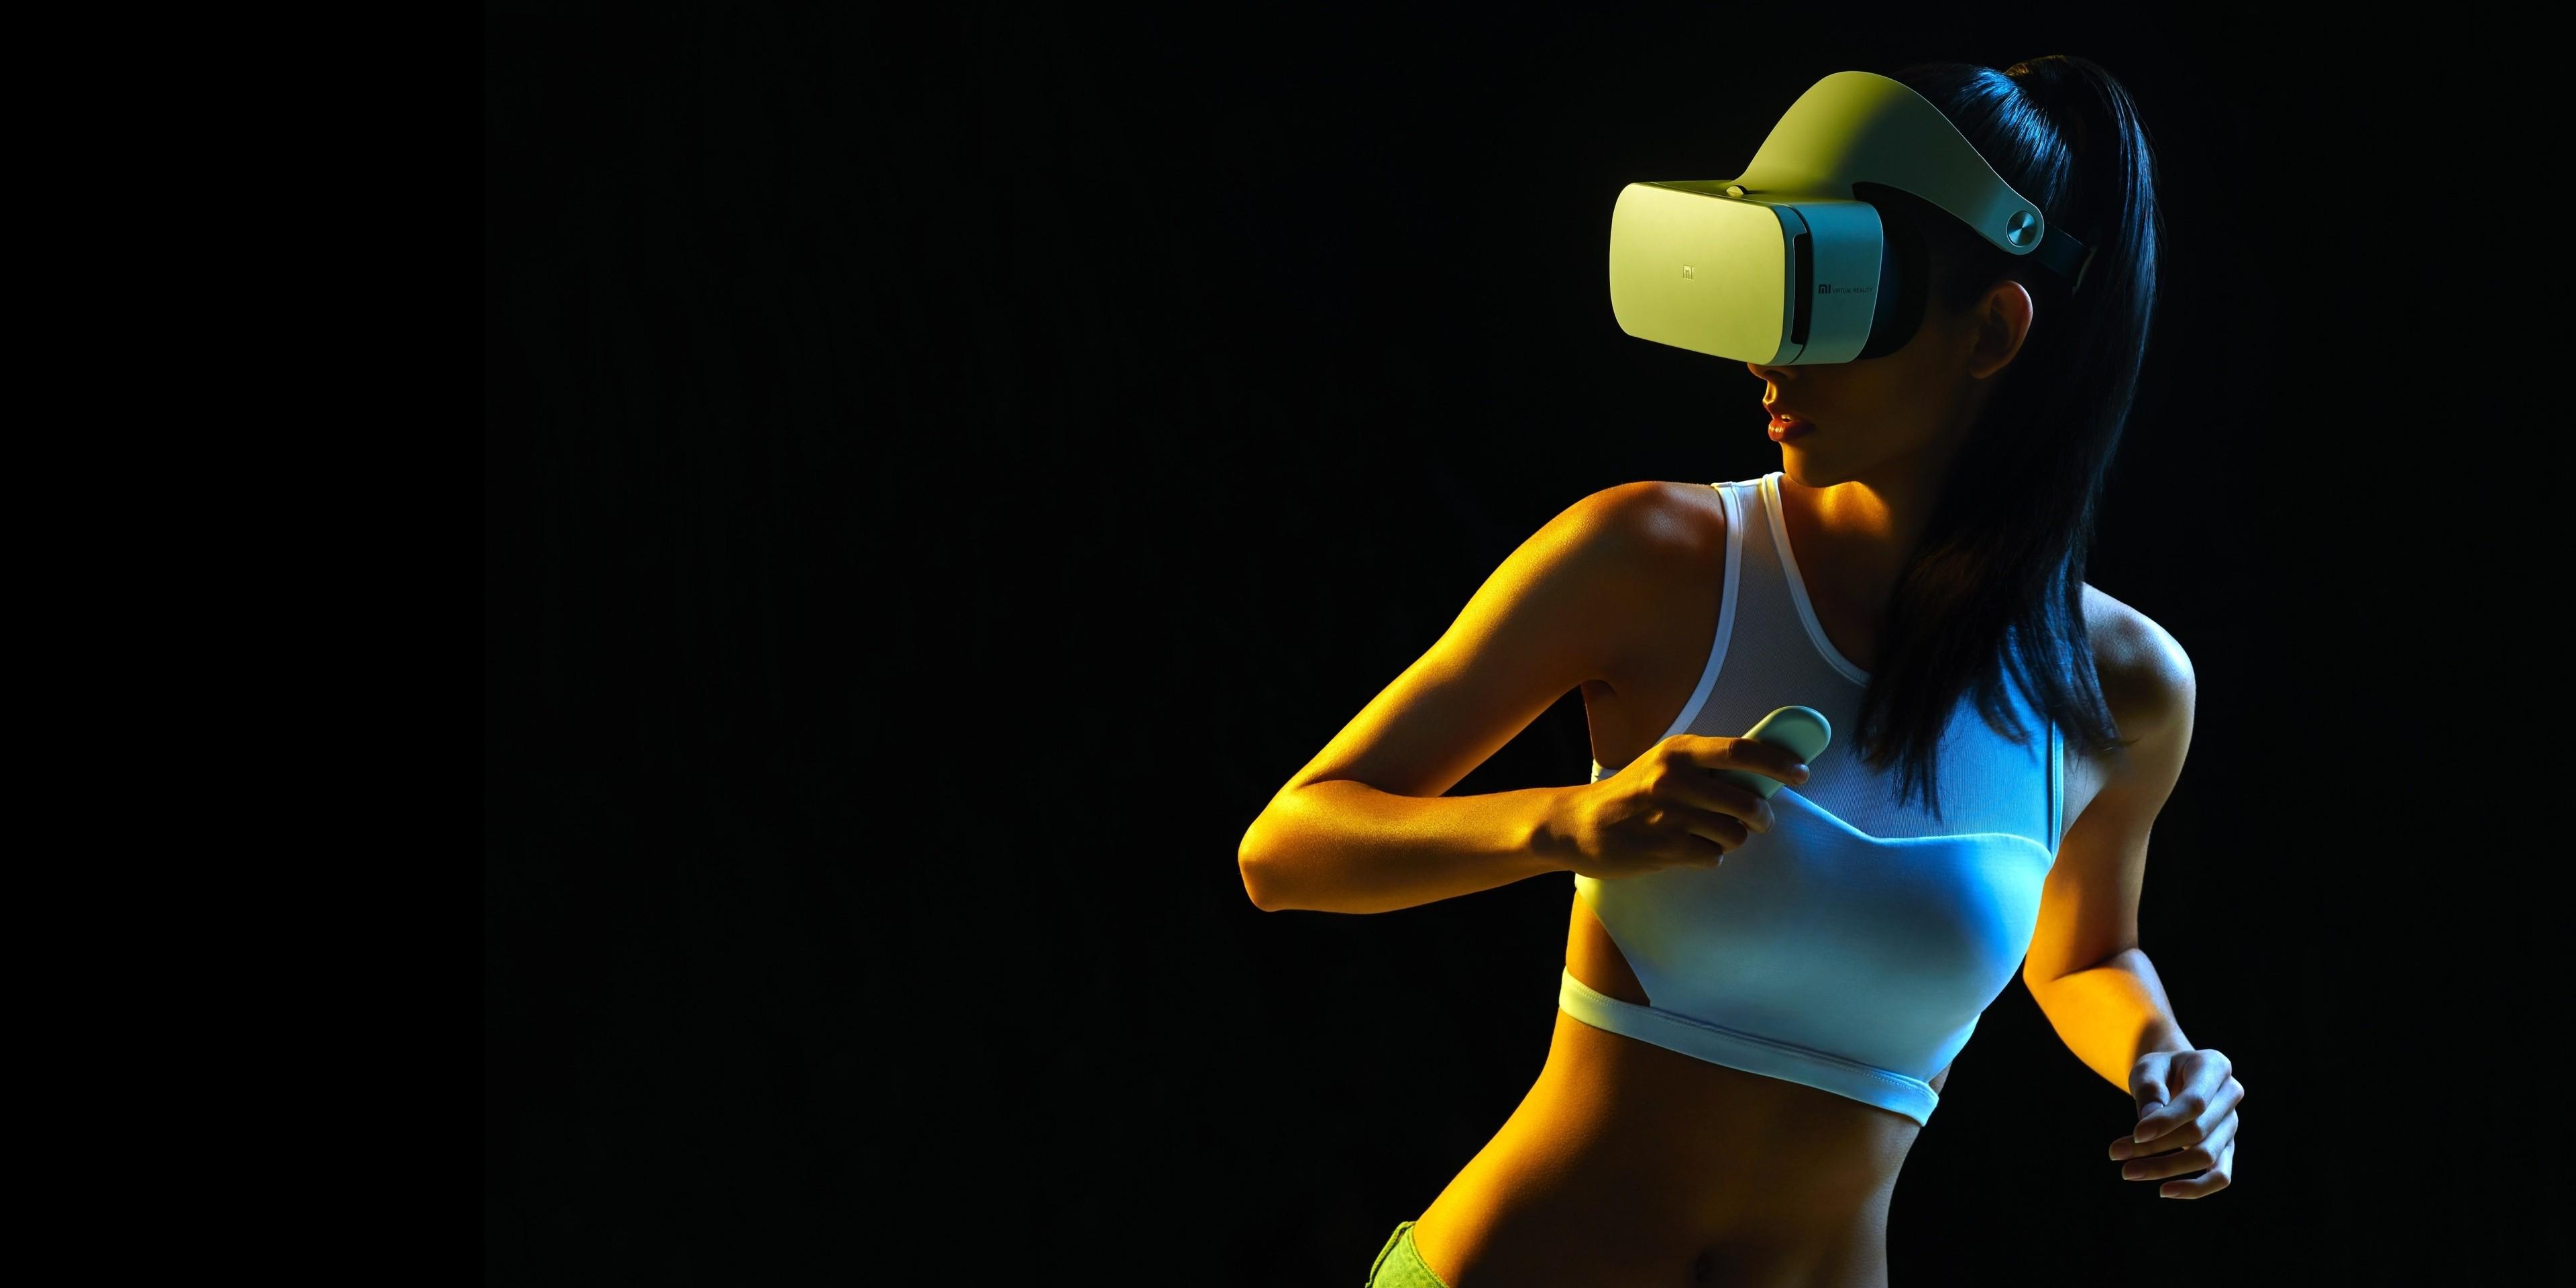 Wallpaper Mi Vr Xiaomi Vr Virtual Reality Vr Headset